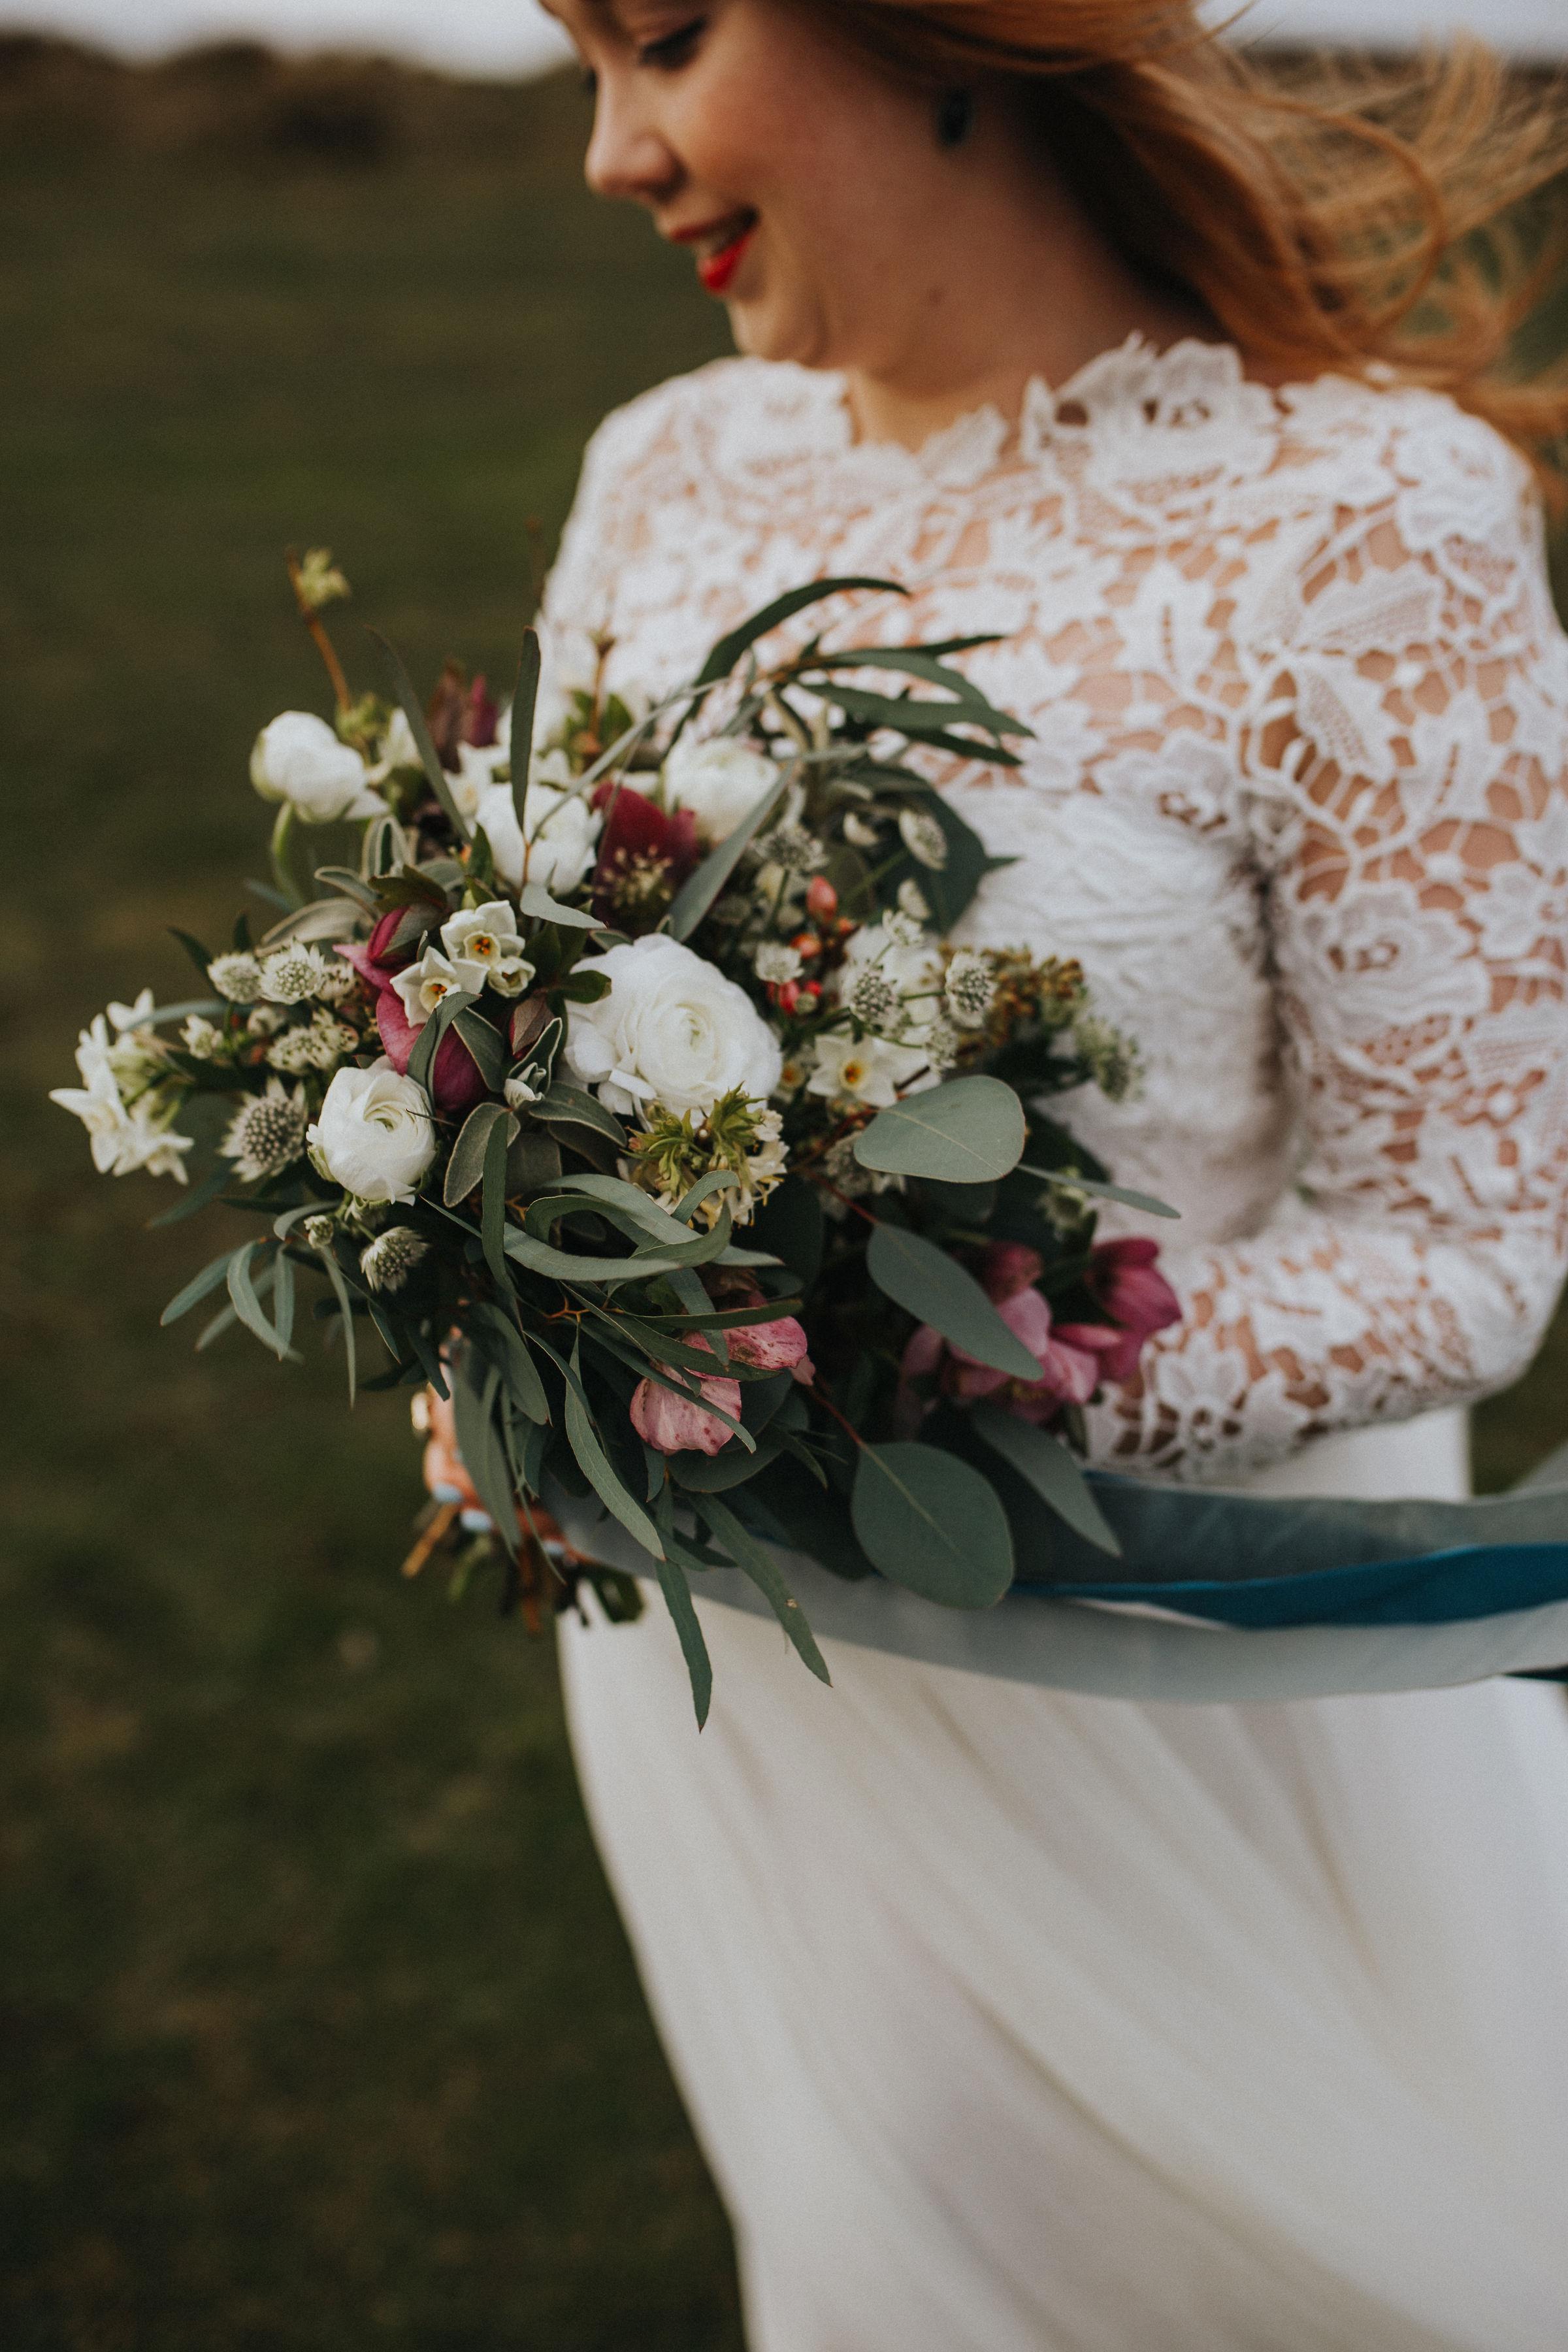 Rosie-bespoke-lace-long sleeved-tulle-wedding-dress-winter-peak district-susanna greening-11.jpg